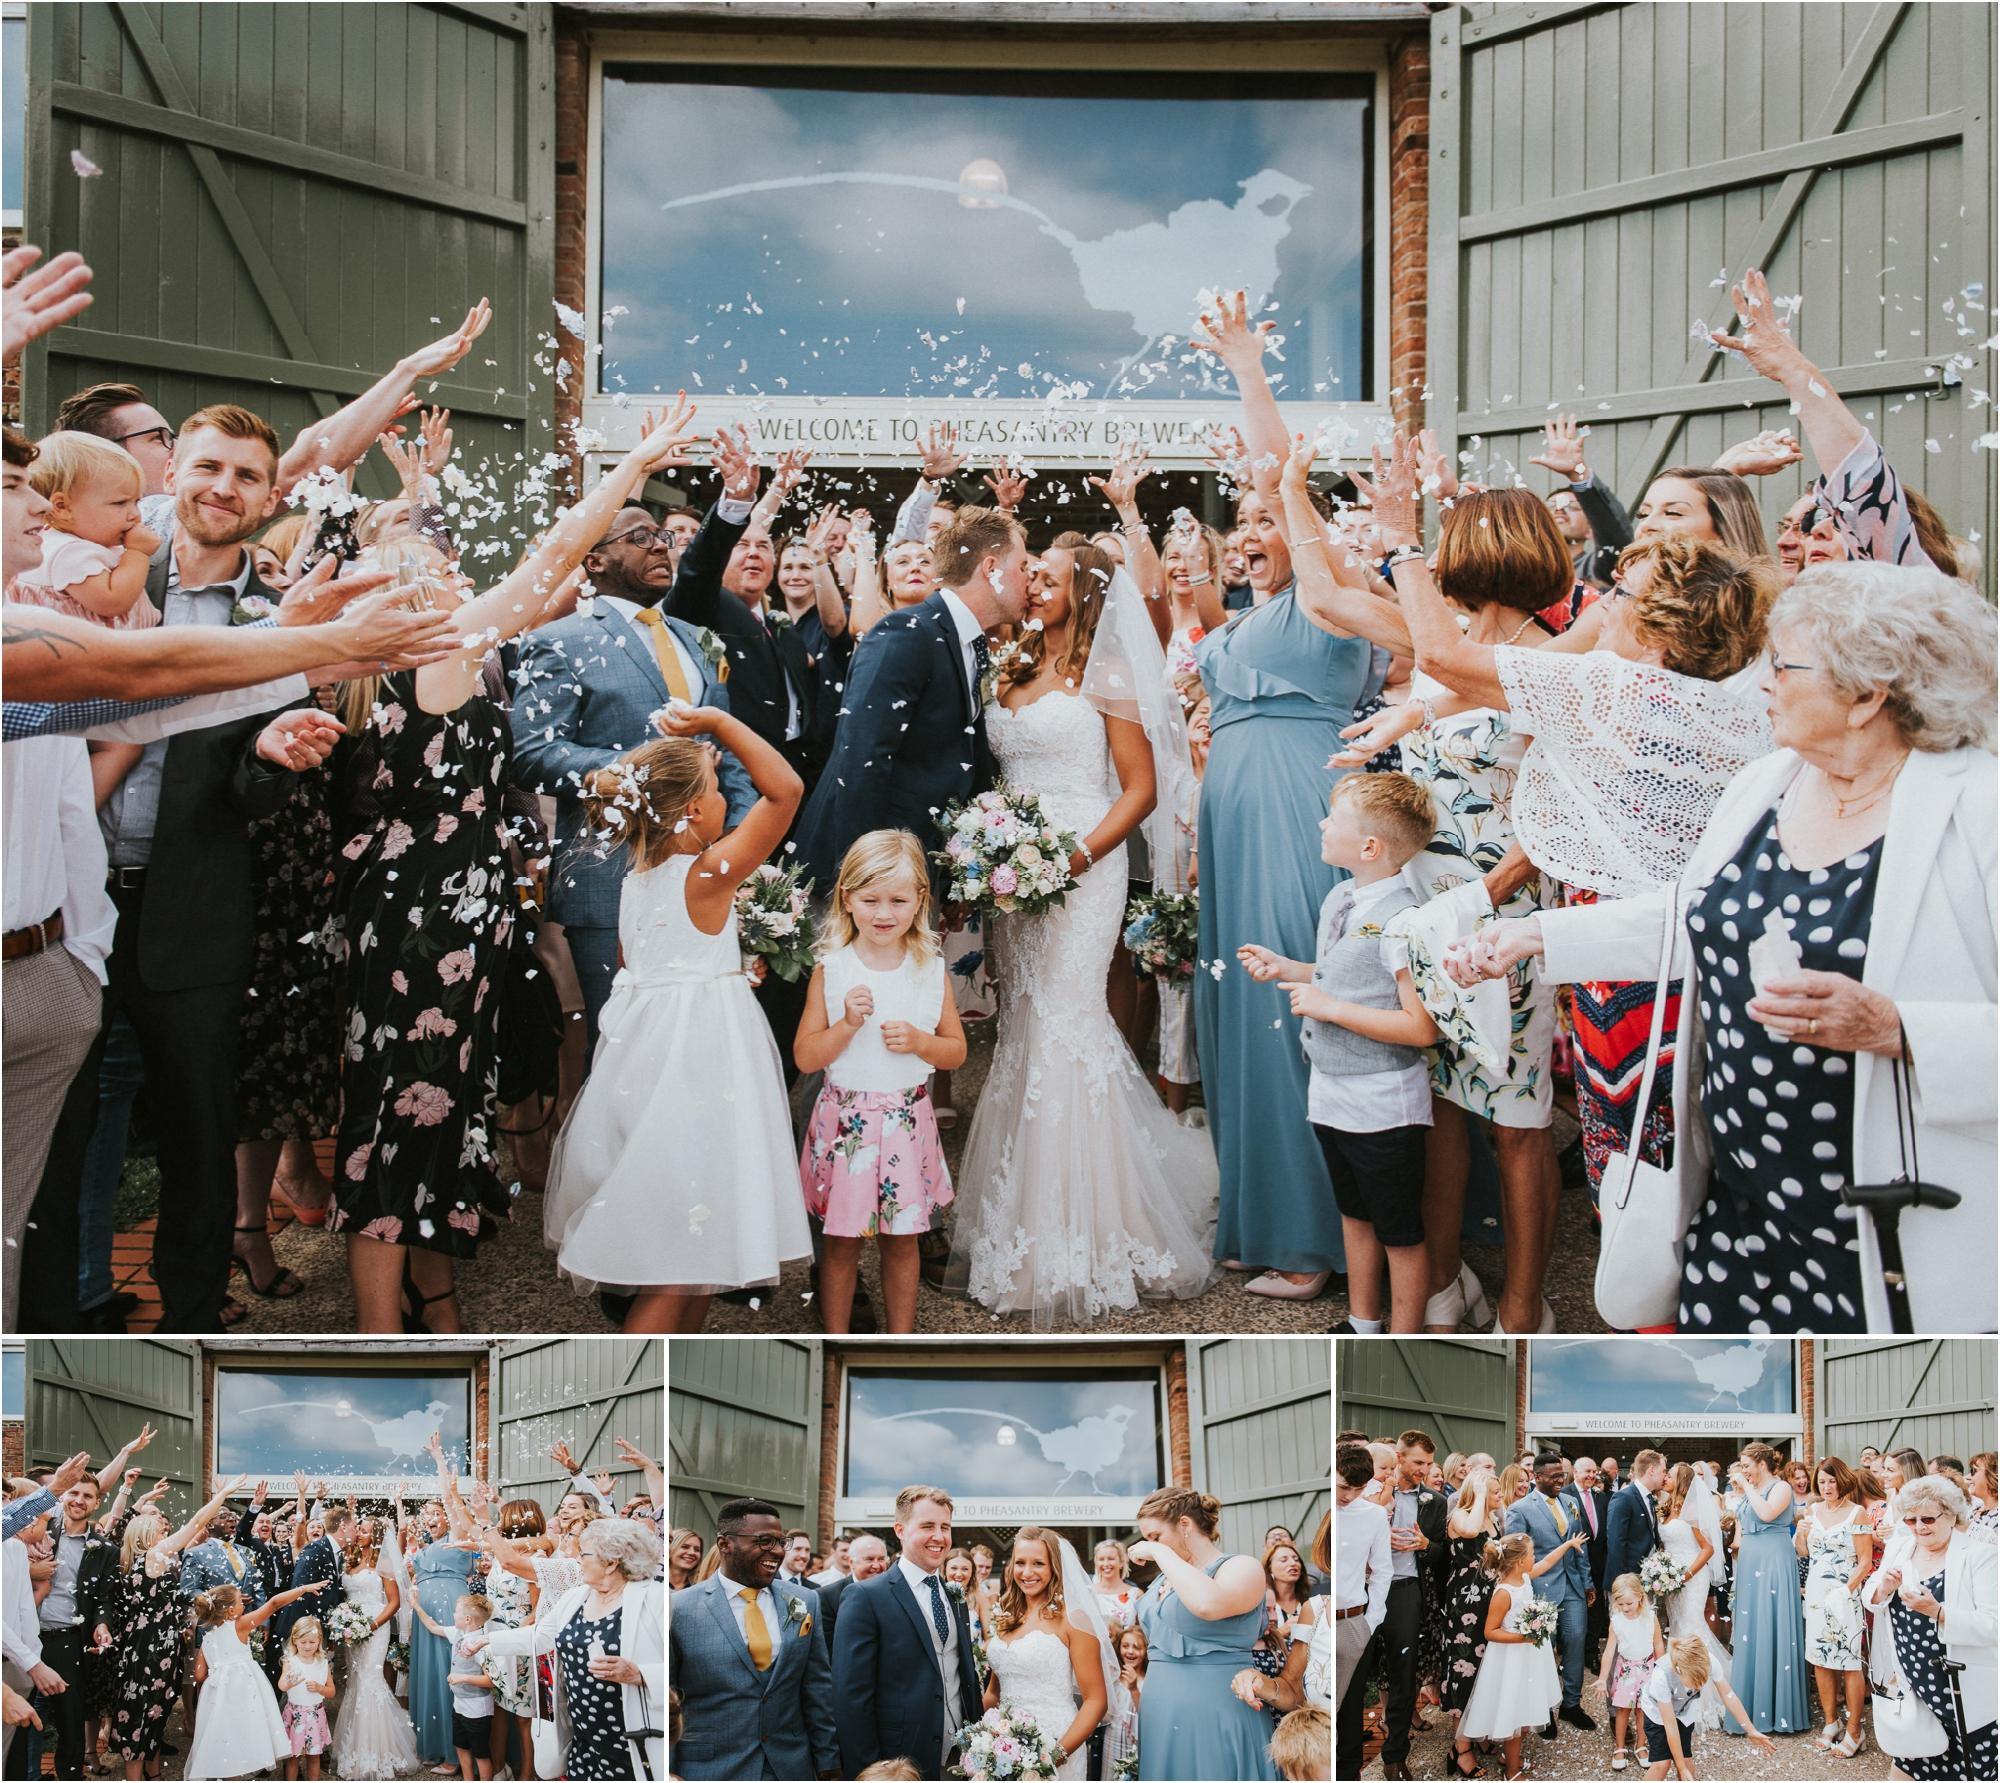 PheasantBrewery-LukeHolroyd-Yorkshirewedding_000122.jpg